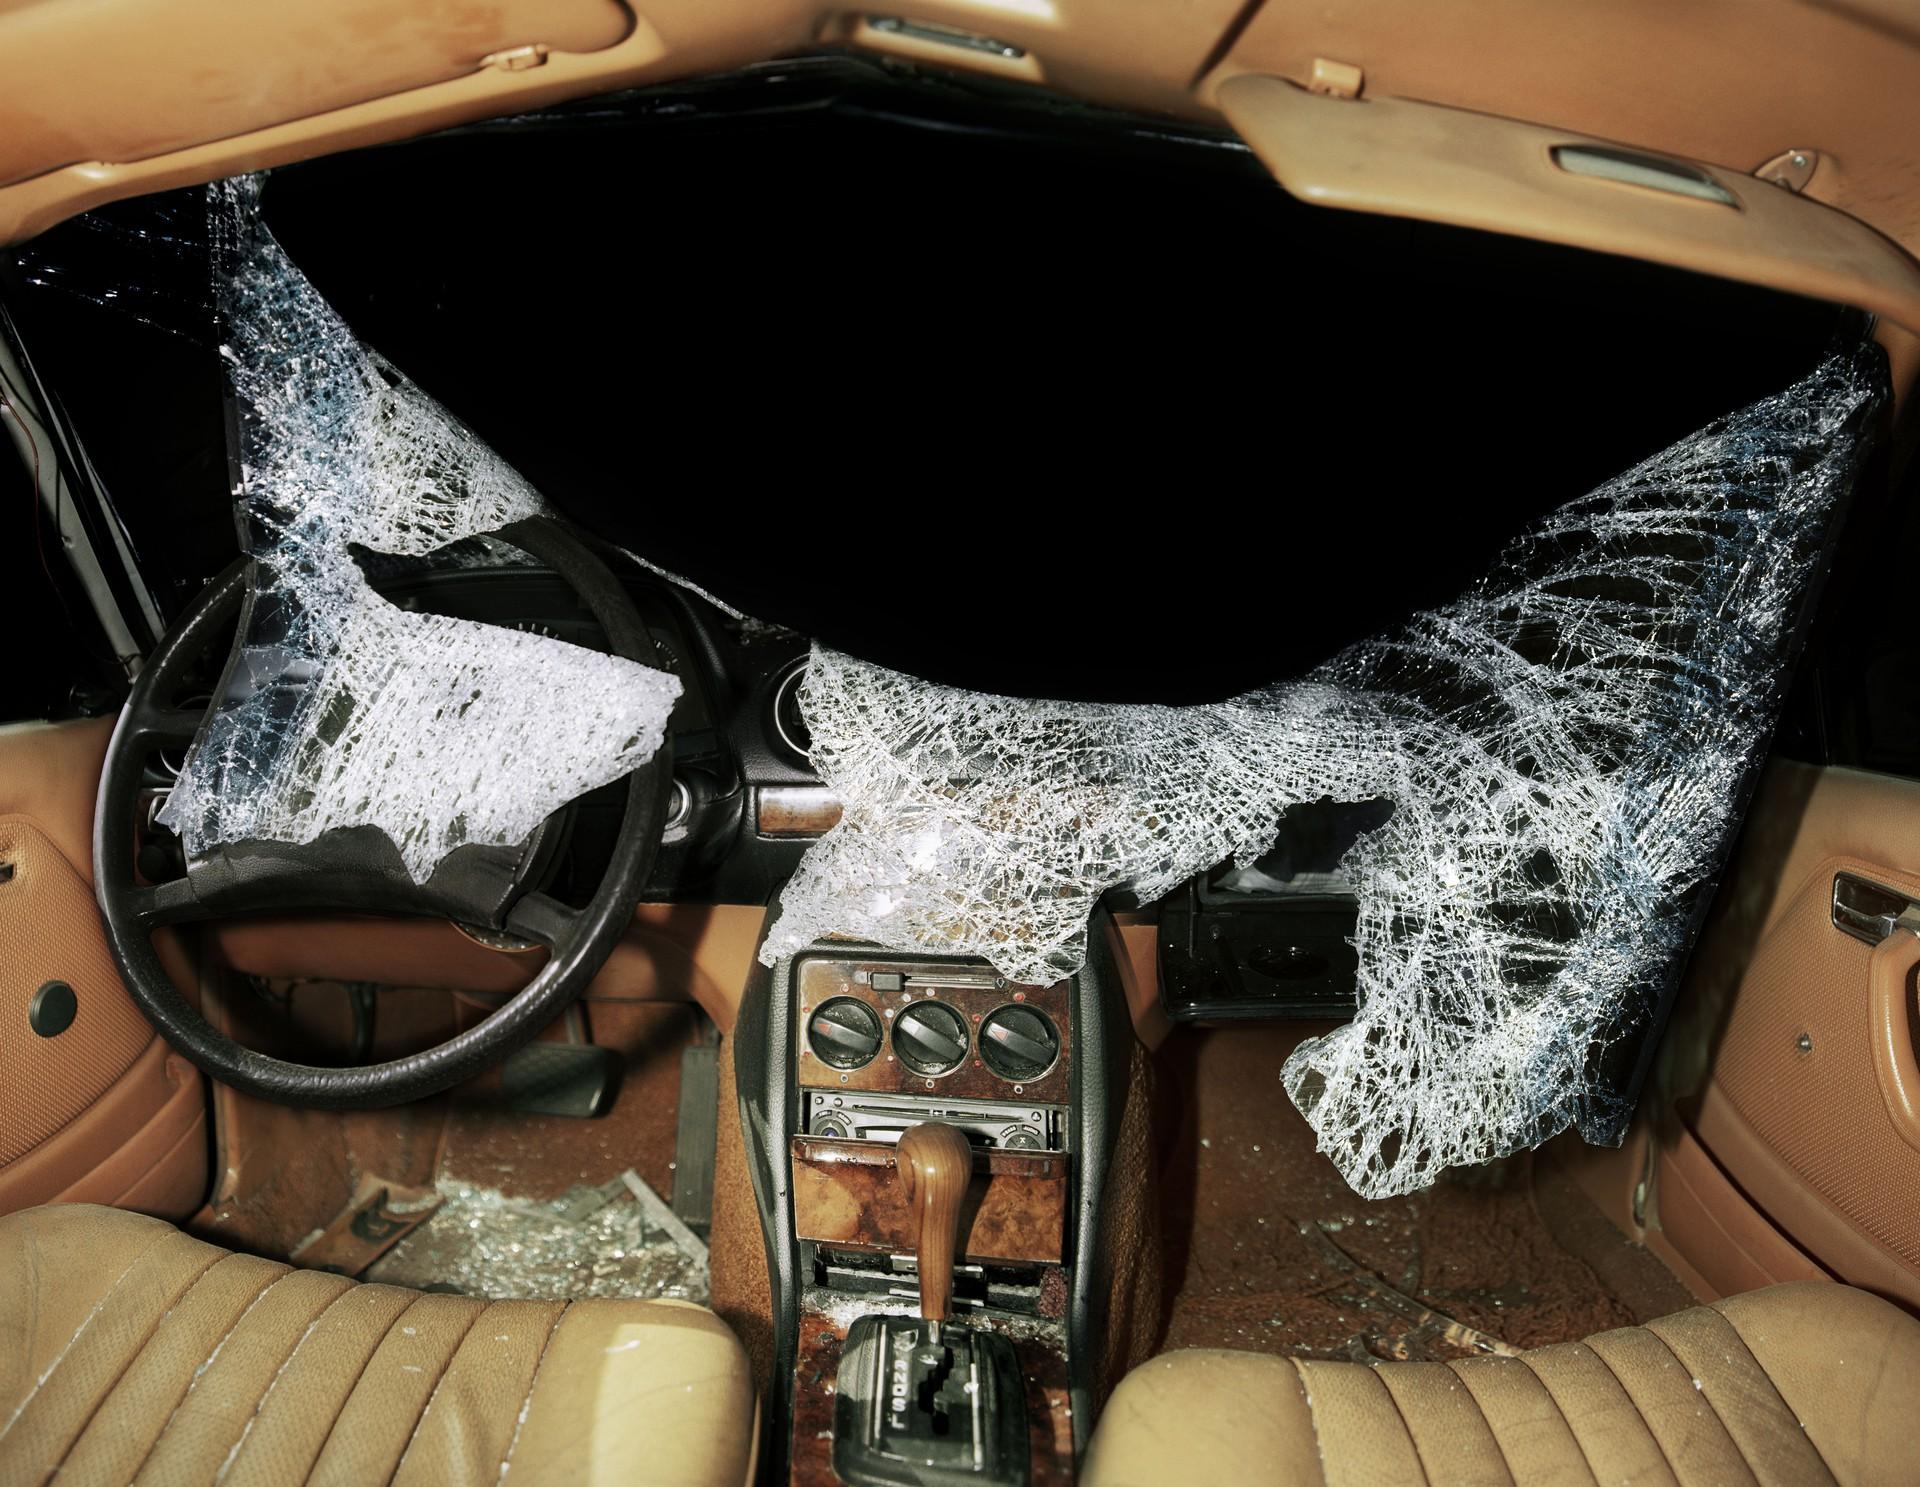 broken in dashboard of wrecked car